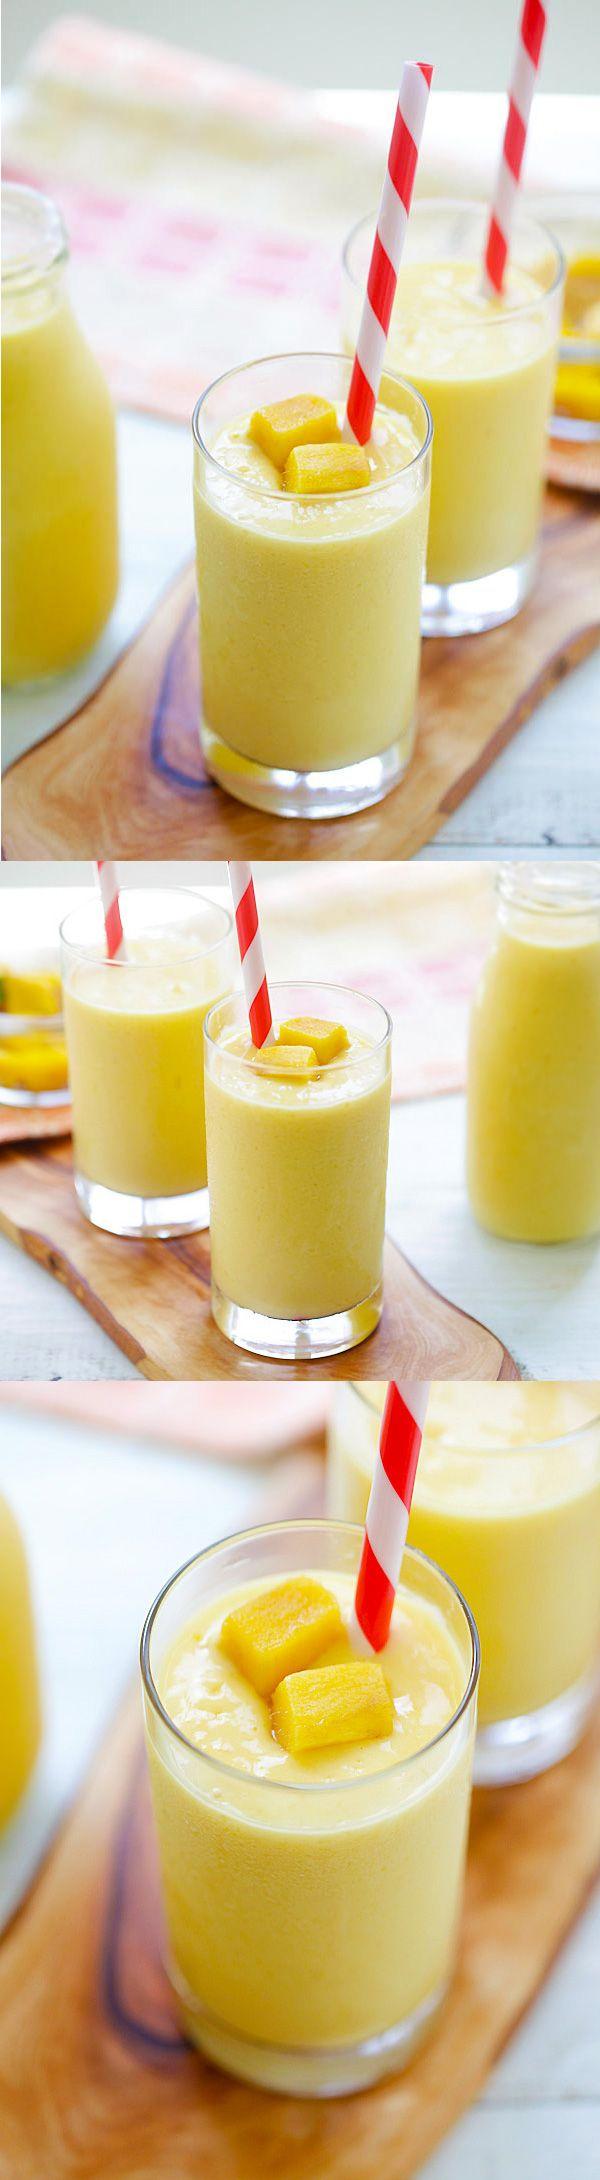 An easy to make recipe for Mango Lassi, a rich, popular Indian beverage with fresh mango, milk, yogurt, and honey. | rasamalaysia.com